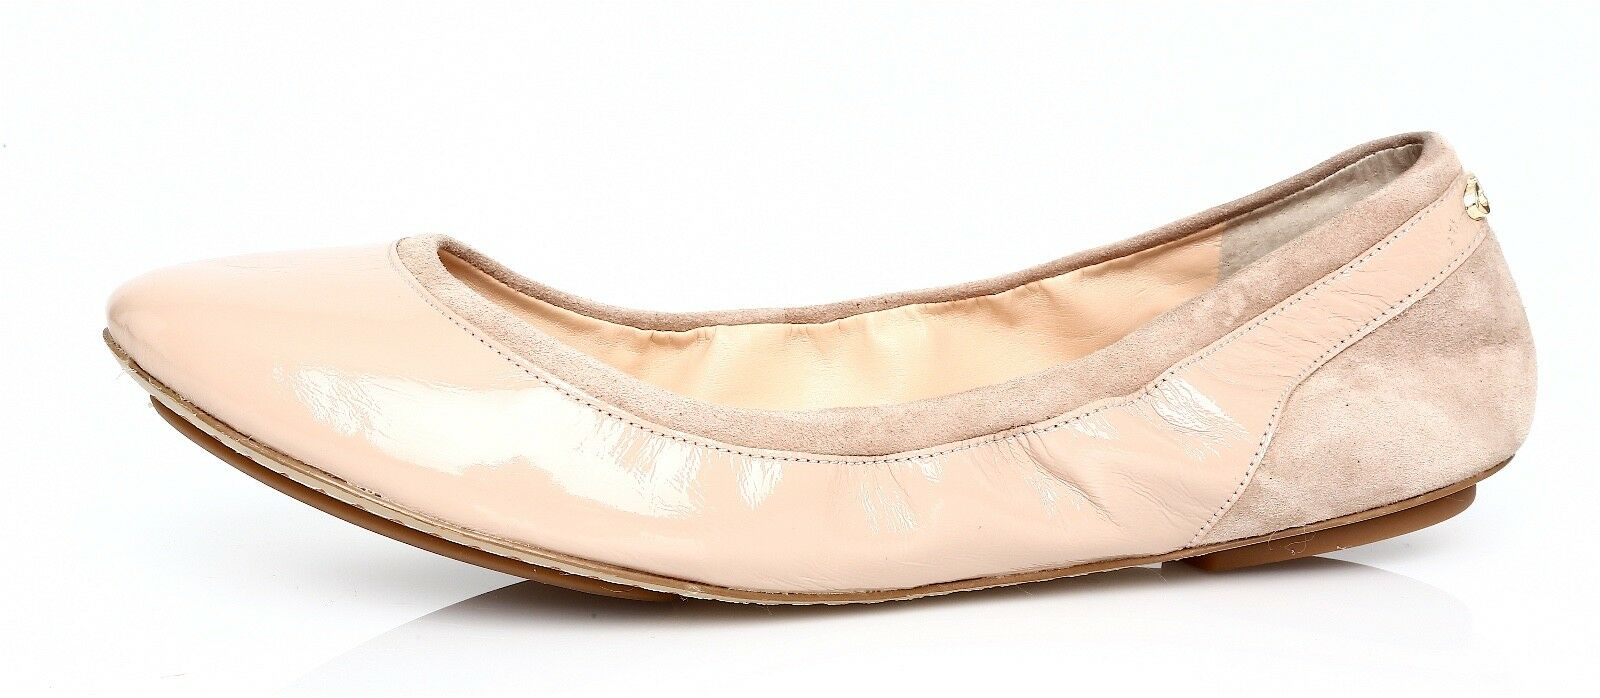 Cole Haan Avery Women's Ballet Maple Sugar Patent Leather Ballet Women's Flat Sz 9.5 B 7913 4e85a6